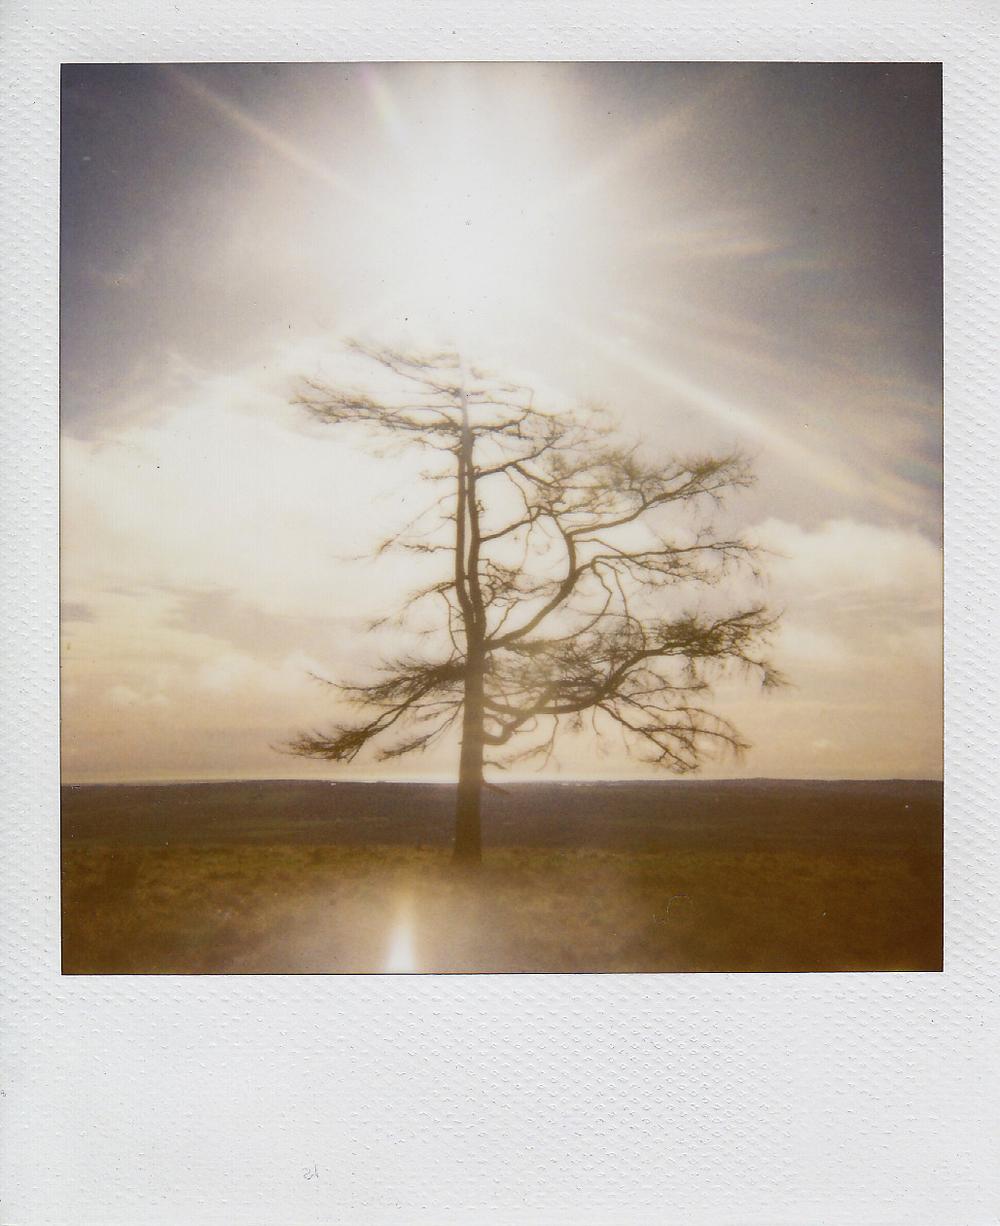 brown caterthun tree.jpg